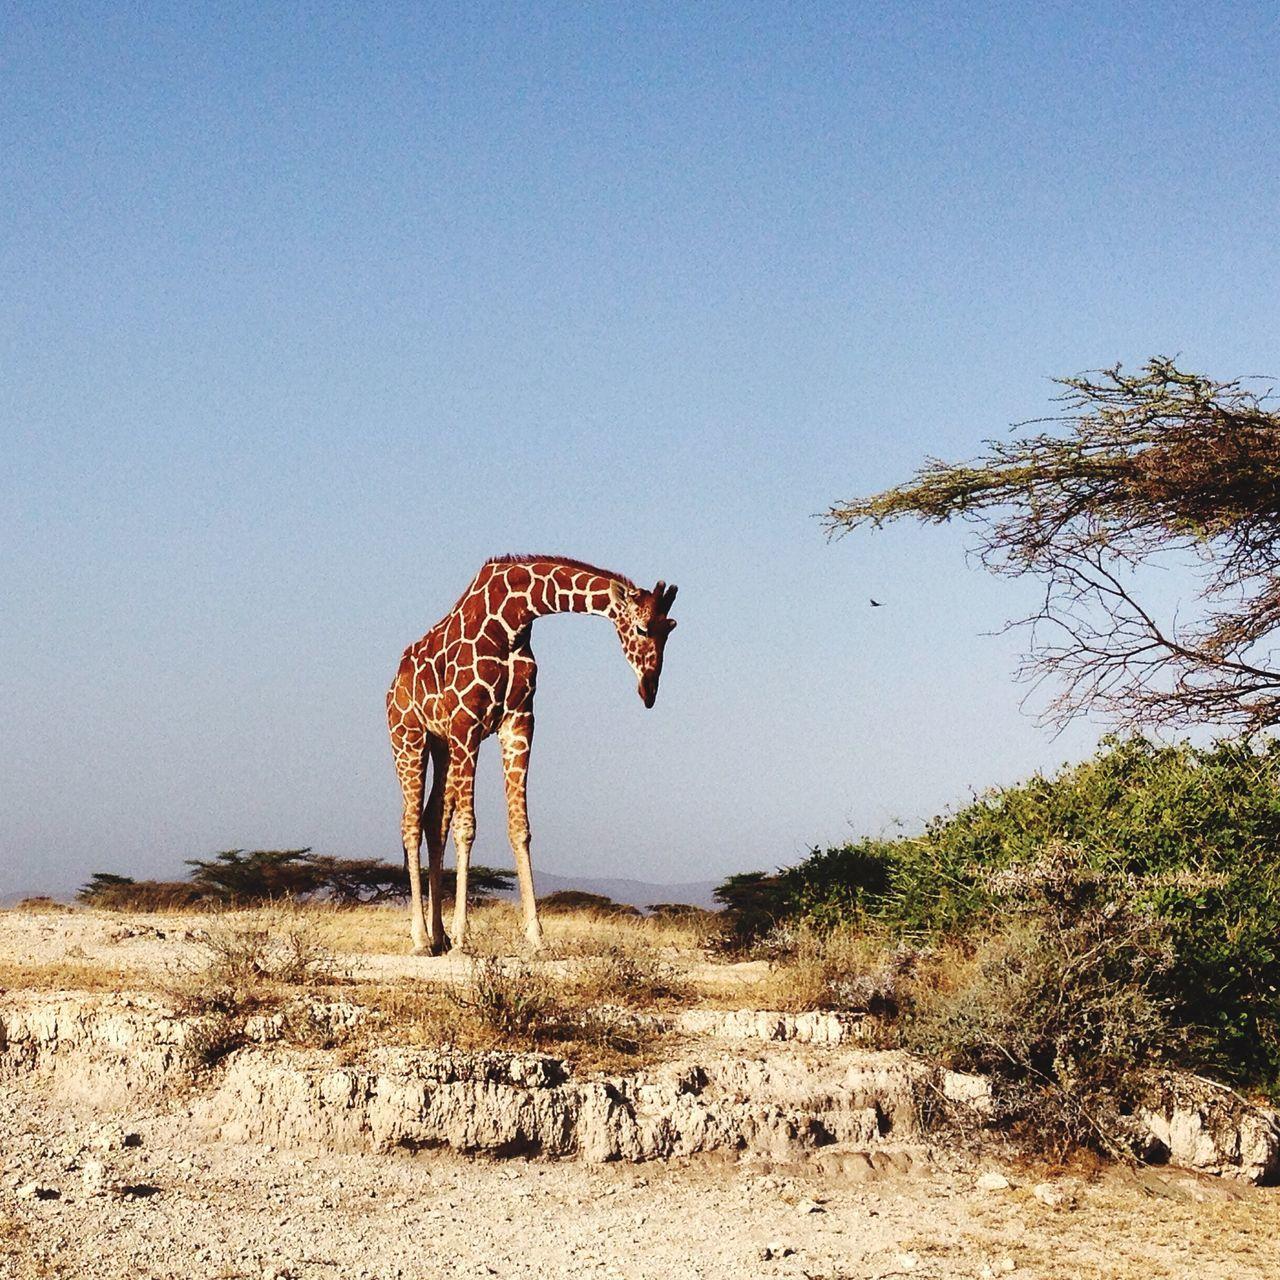 Beautiful stock photos of giraffe, Animal Themes, Animals In The Wild, Arid Climate, Clear Sky